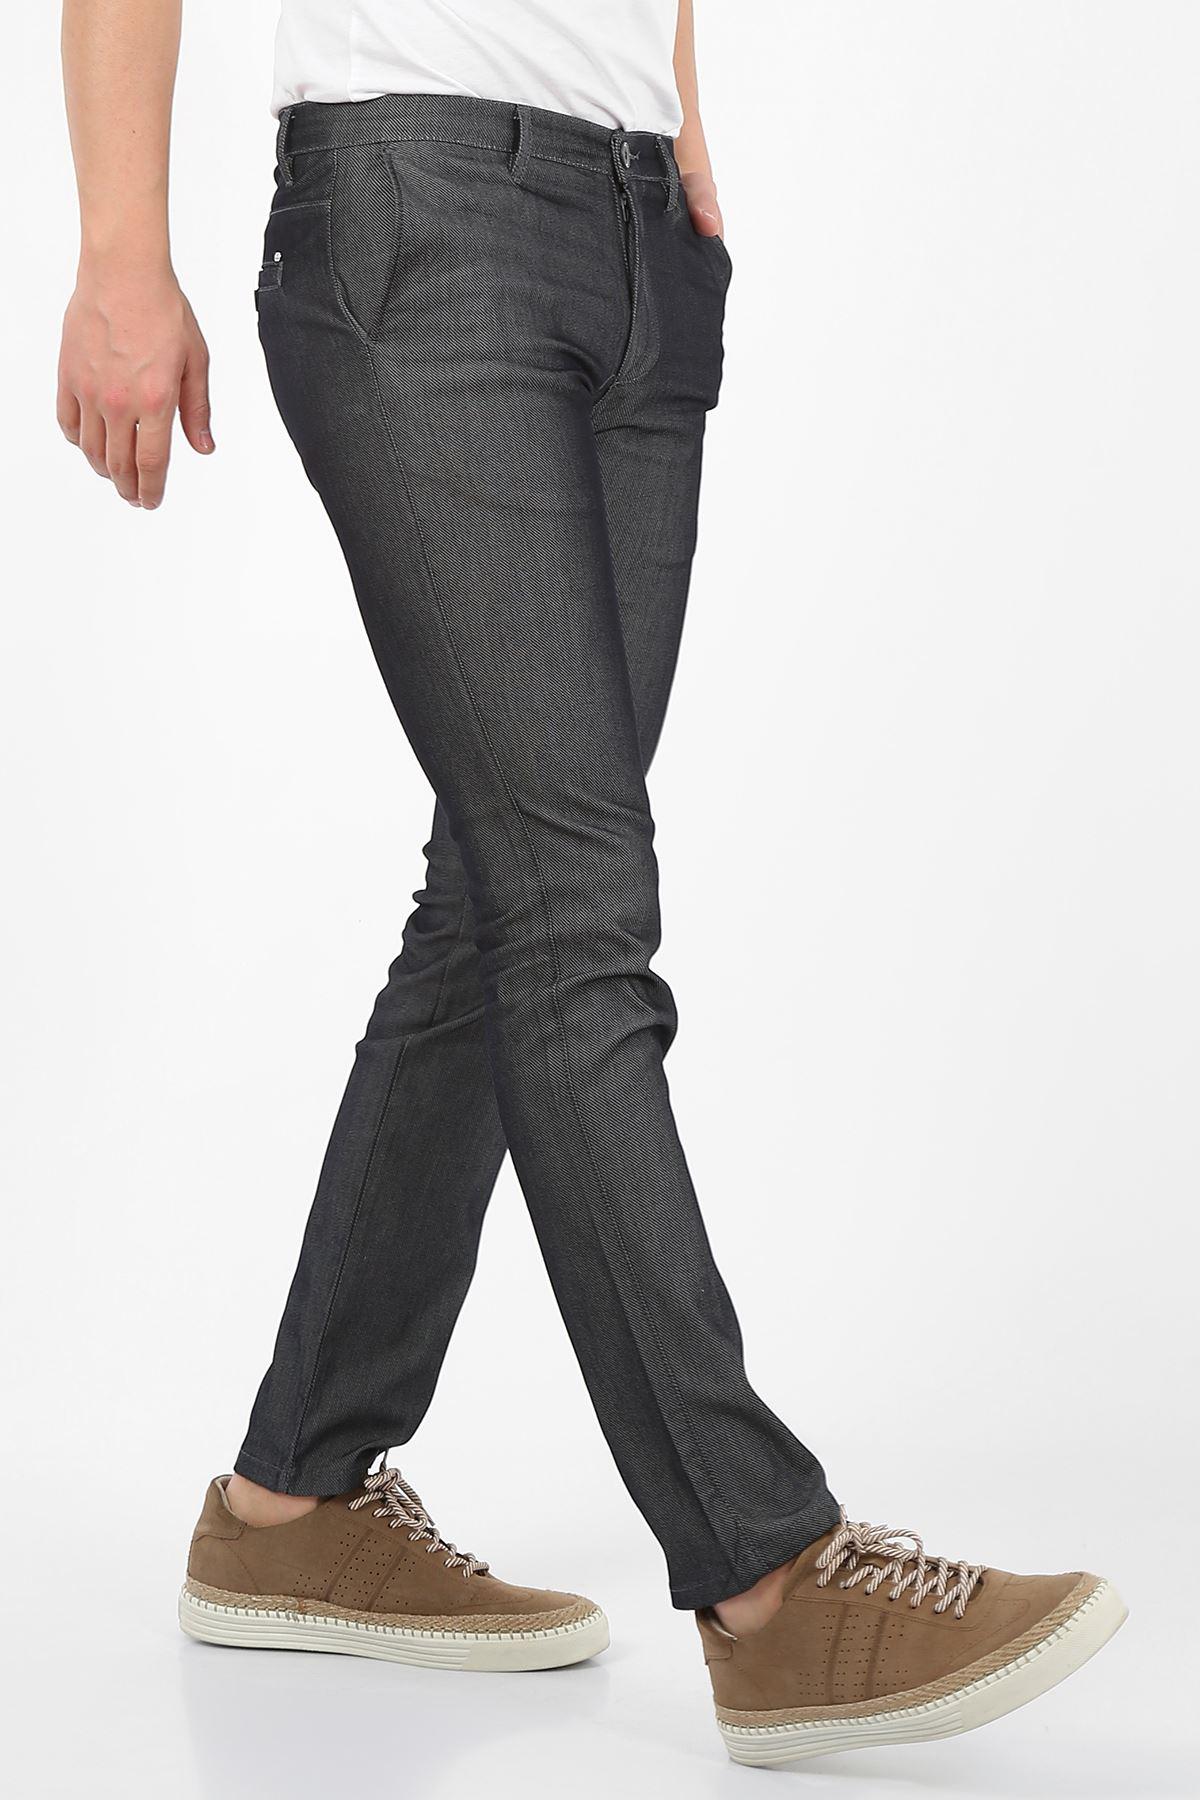 Koyu lacivert Slim Fit Erkek Chino Pantolon -OLİVER